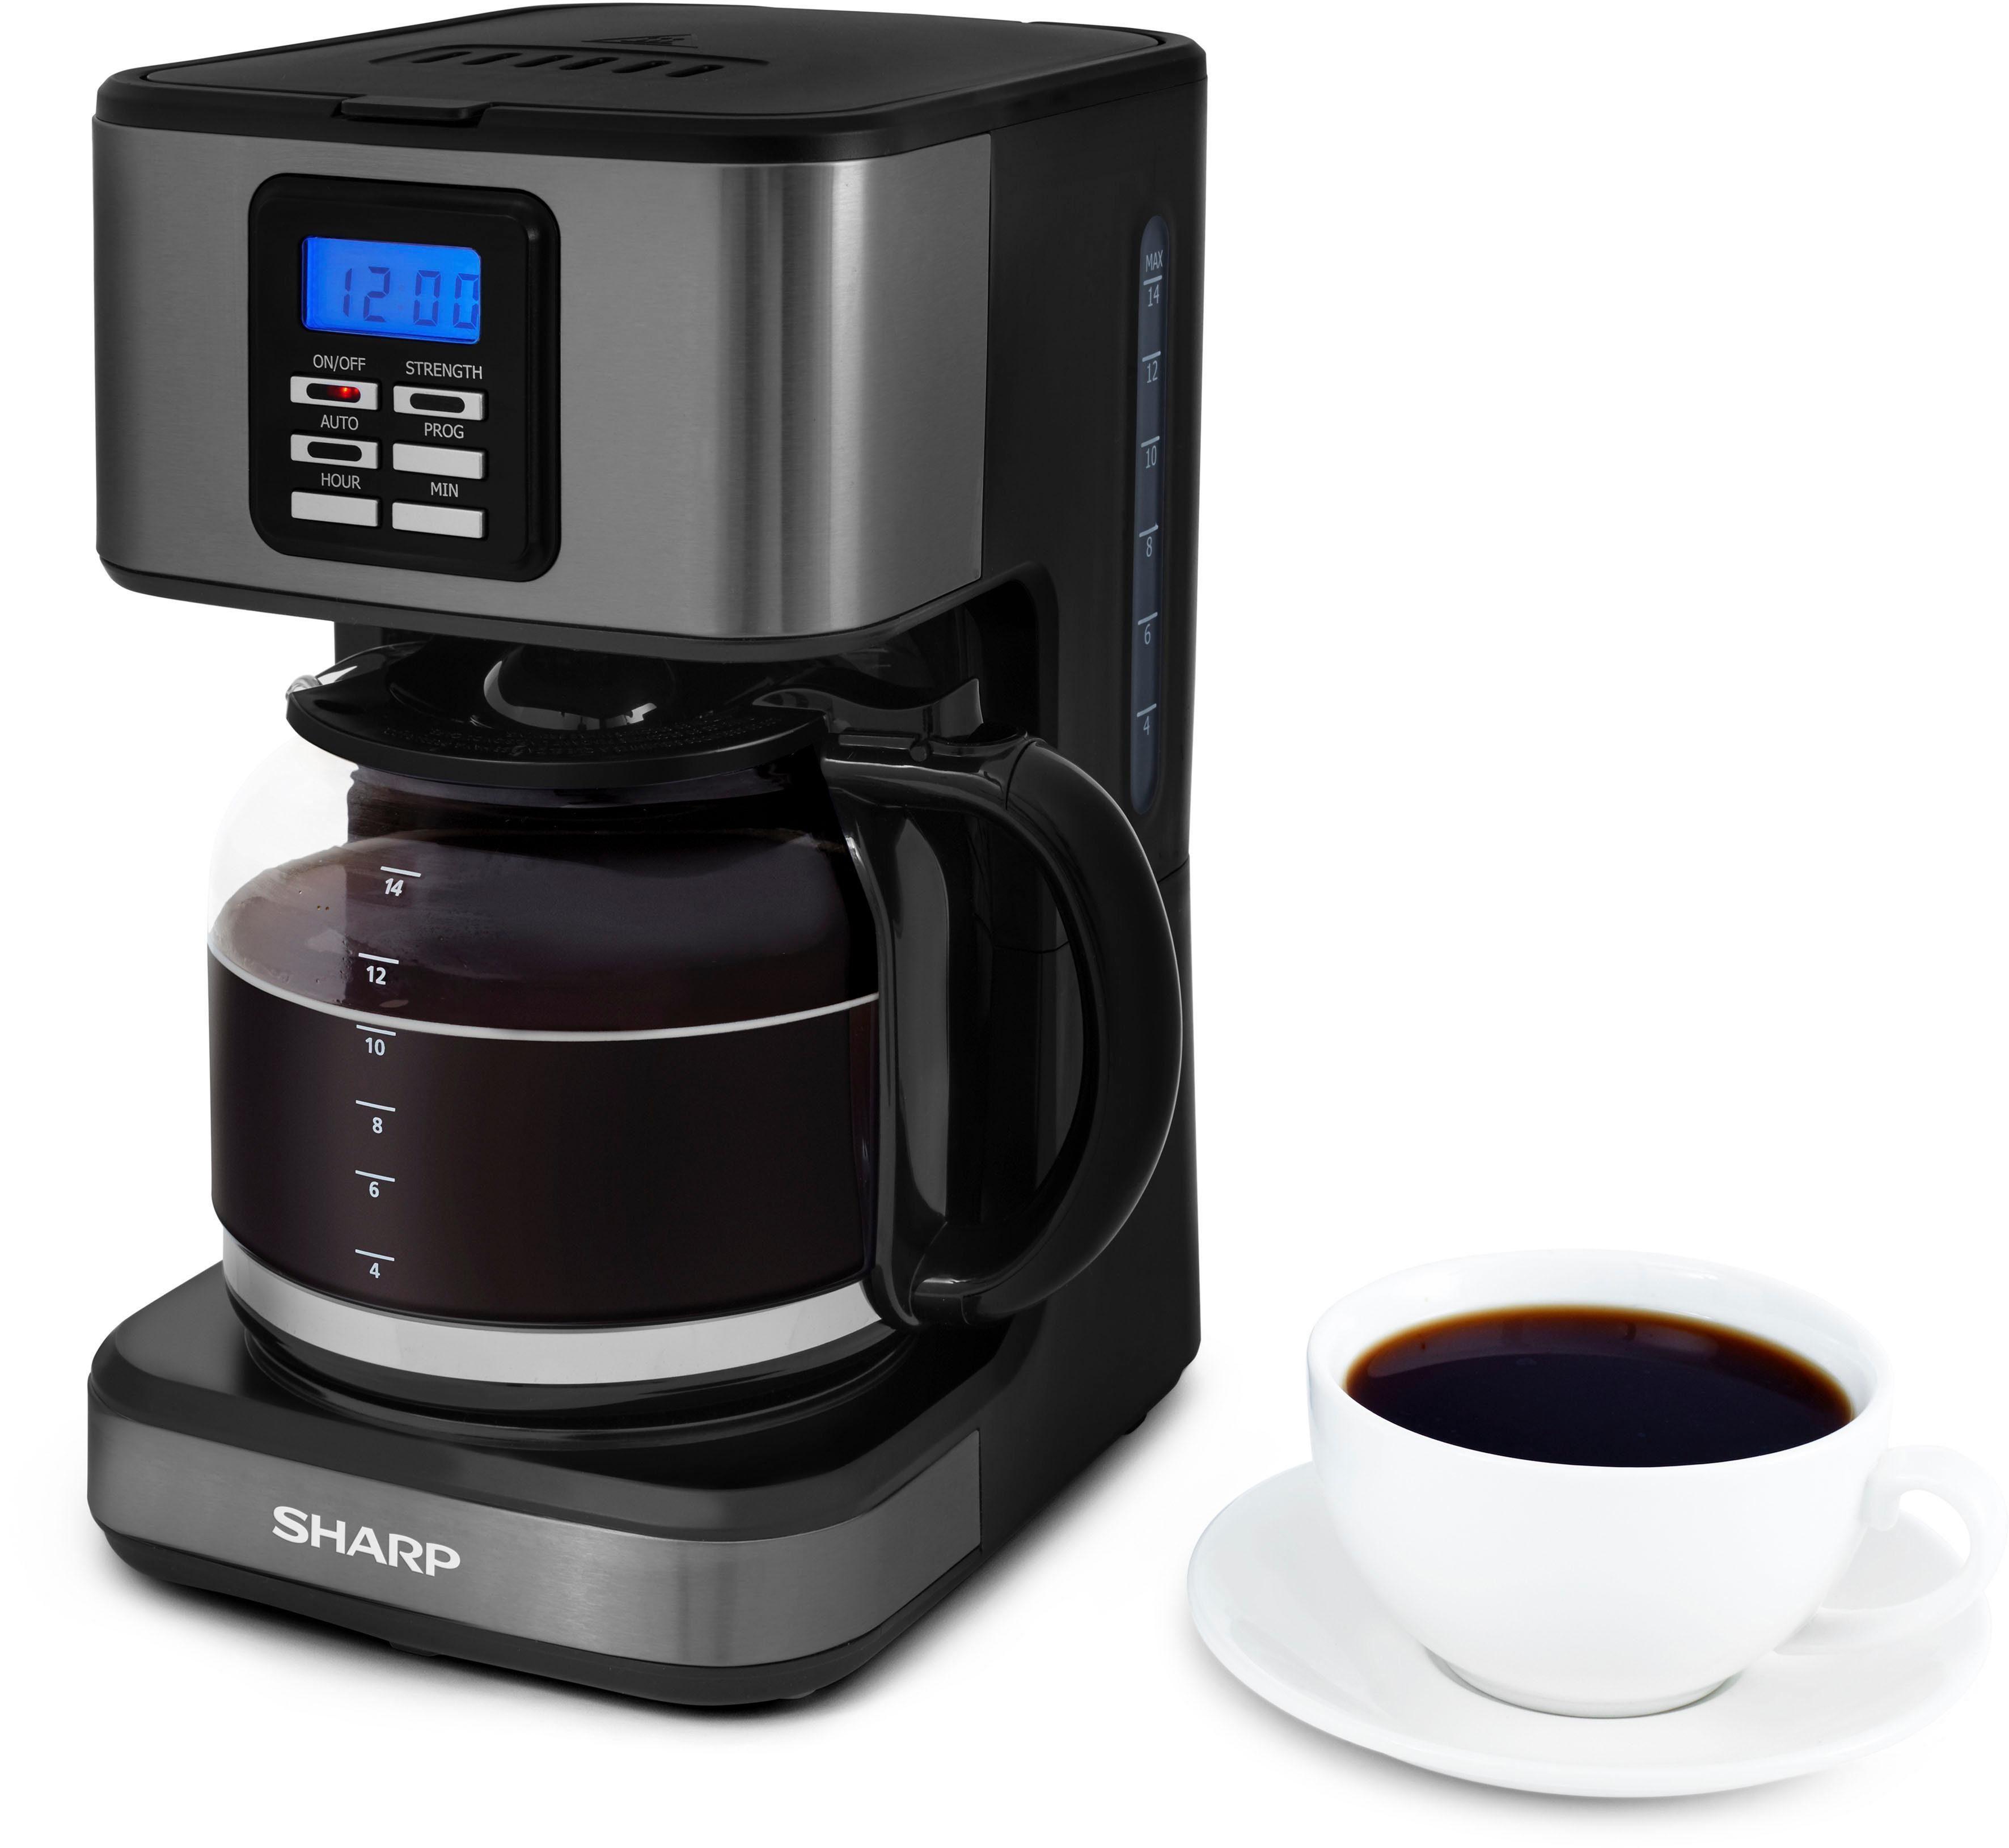 Sharp Filterkaffeemaschine SA-BC2002A, 1,8l Kaffeekanne, Permanentfilter 1x4